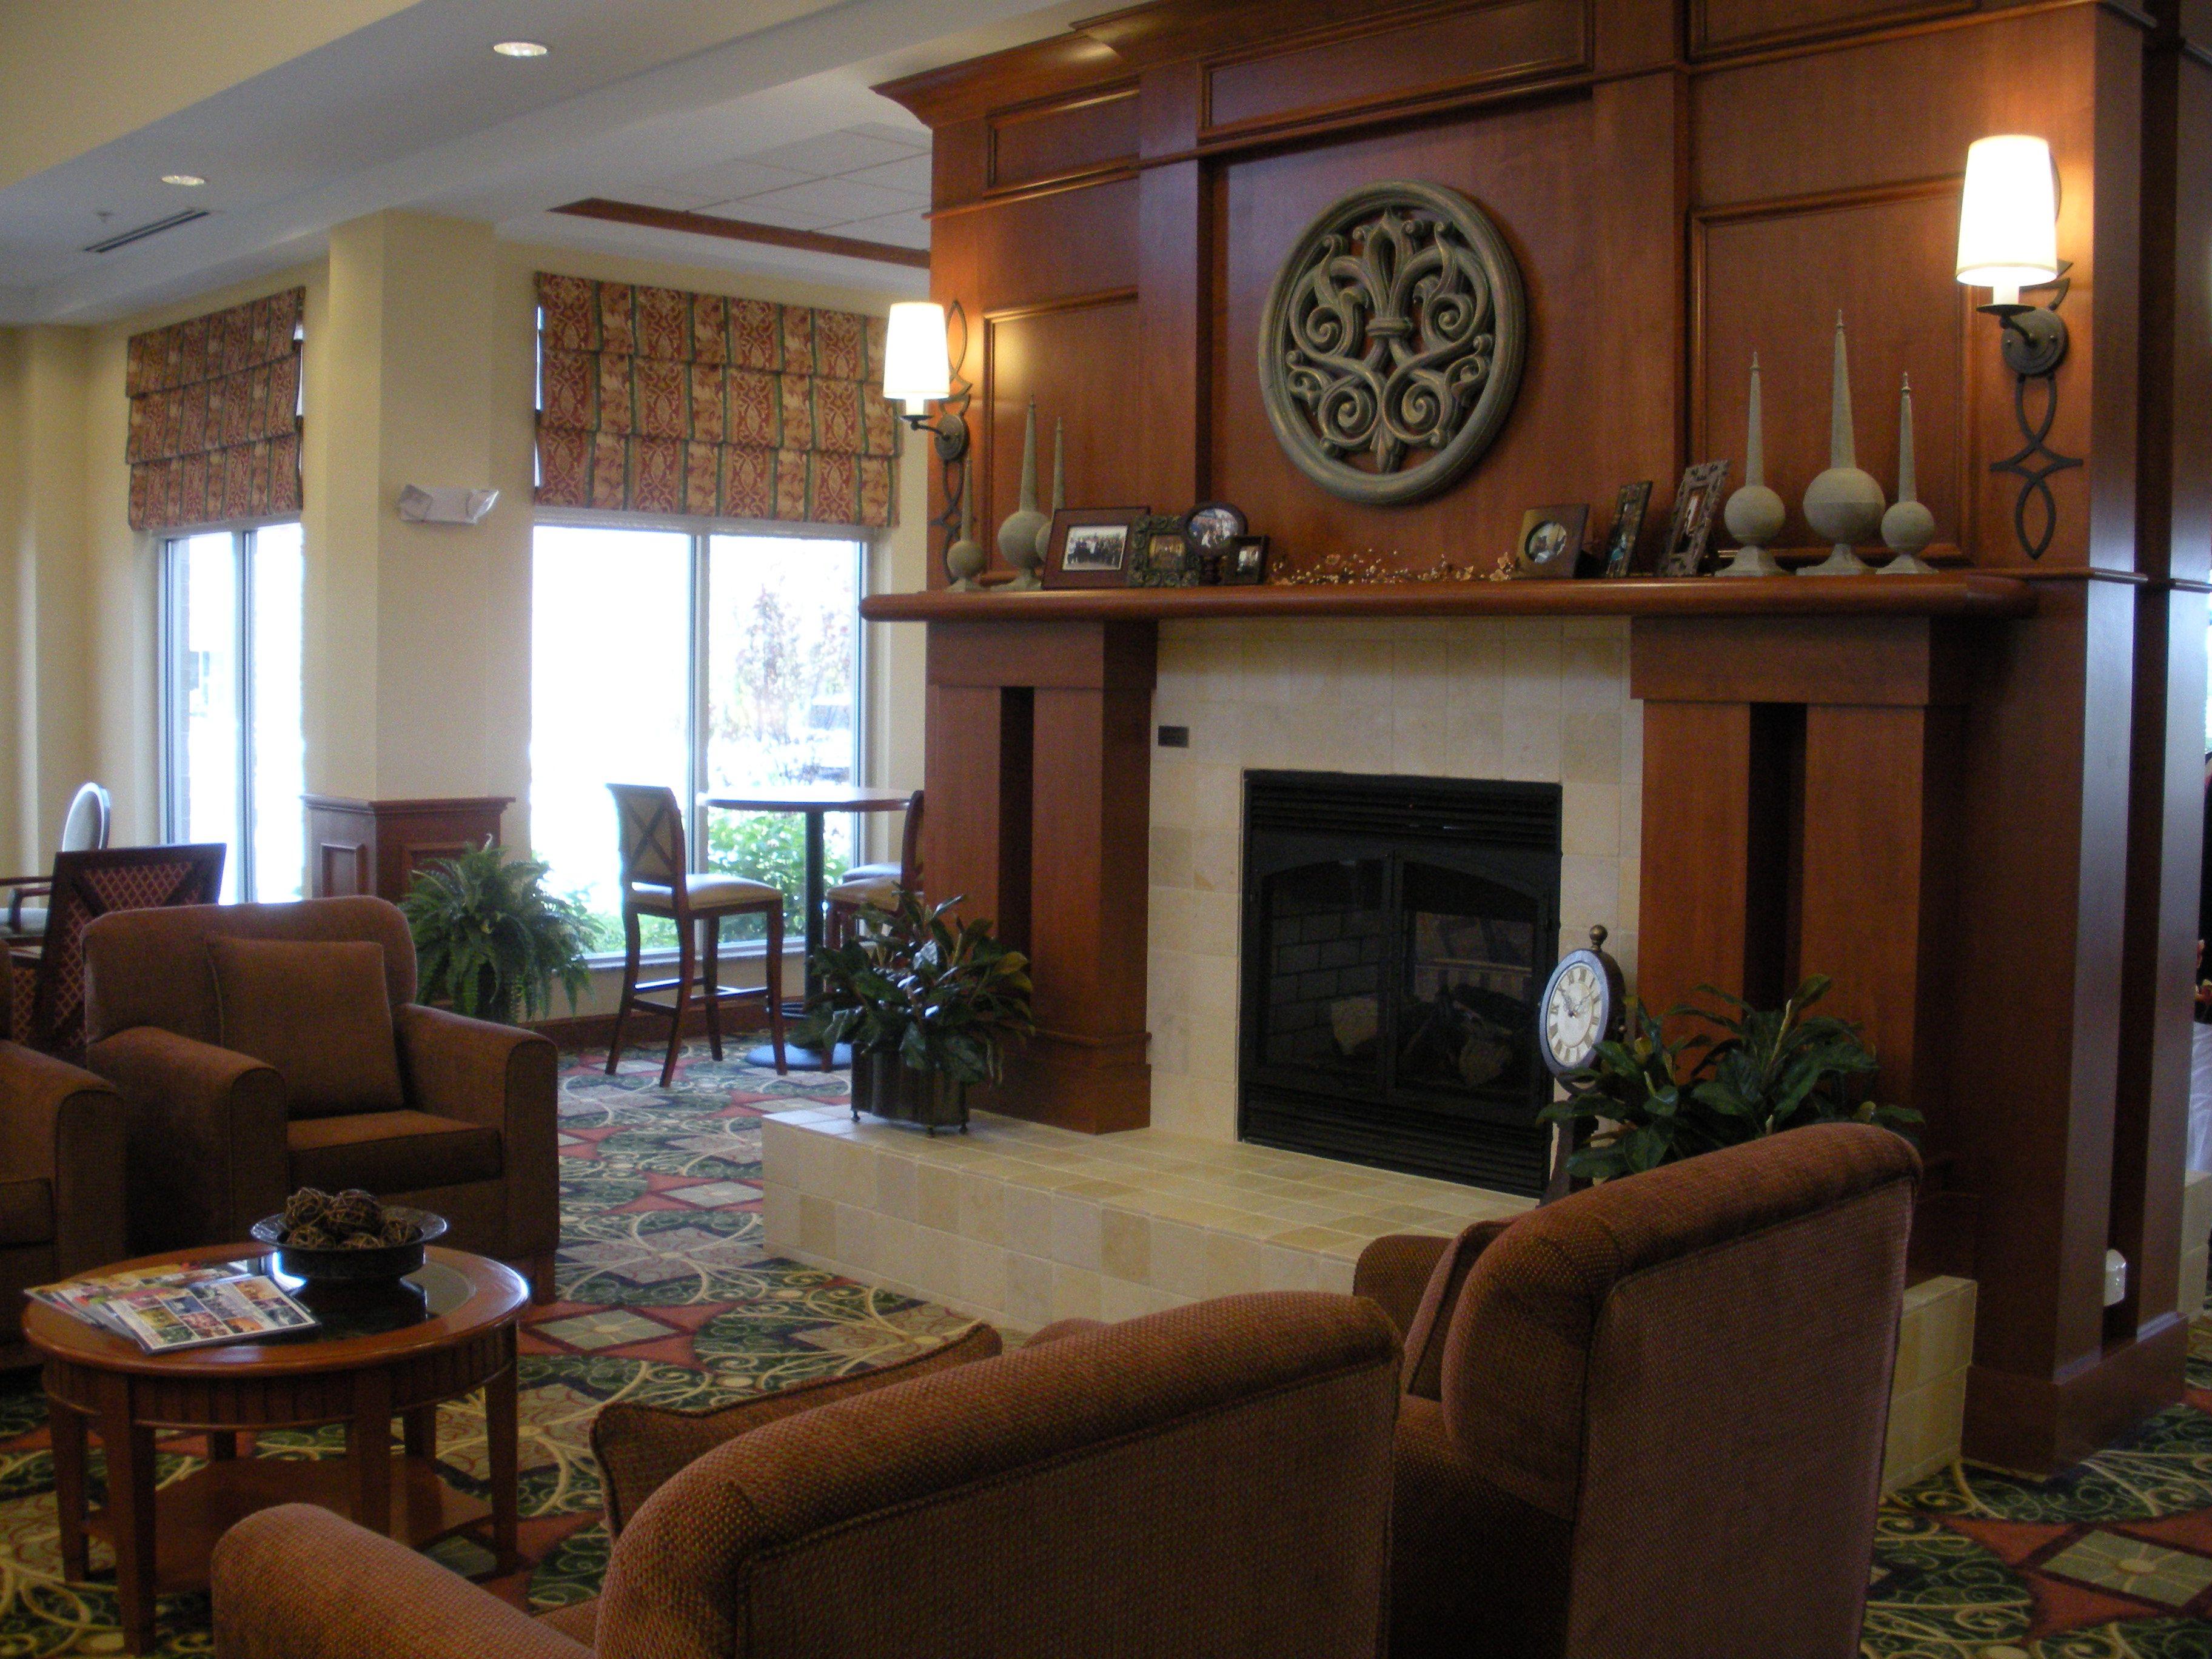 Hilton Garden Inn, Mettawa | Hotels | Pinterest | Lakes